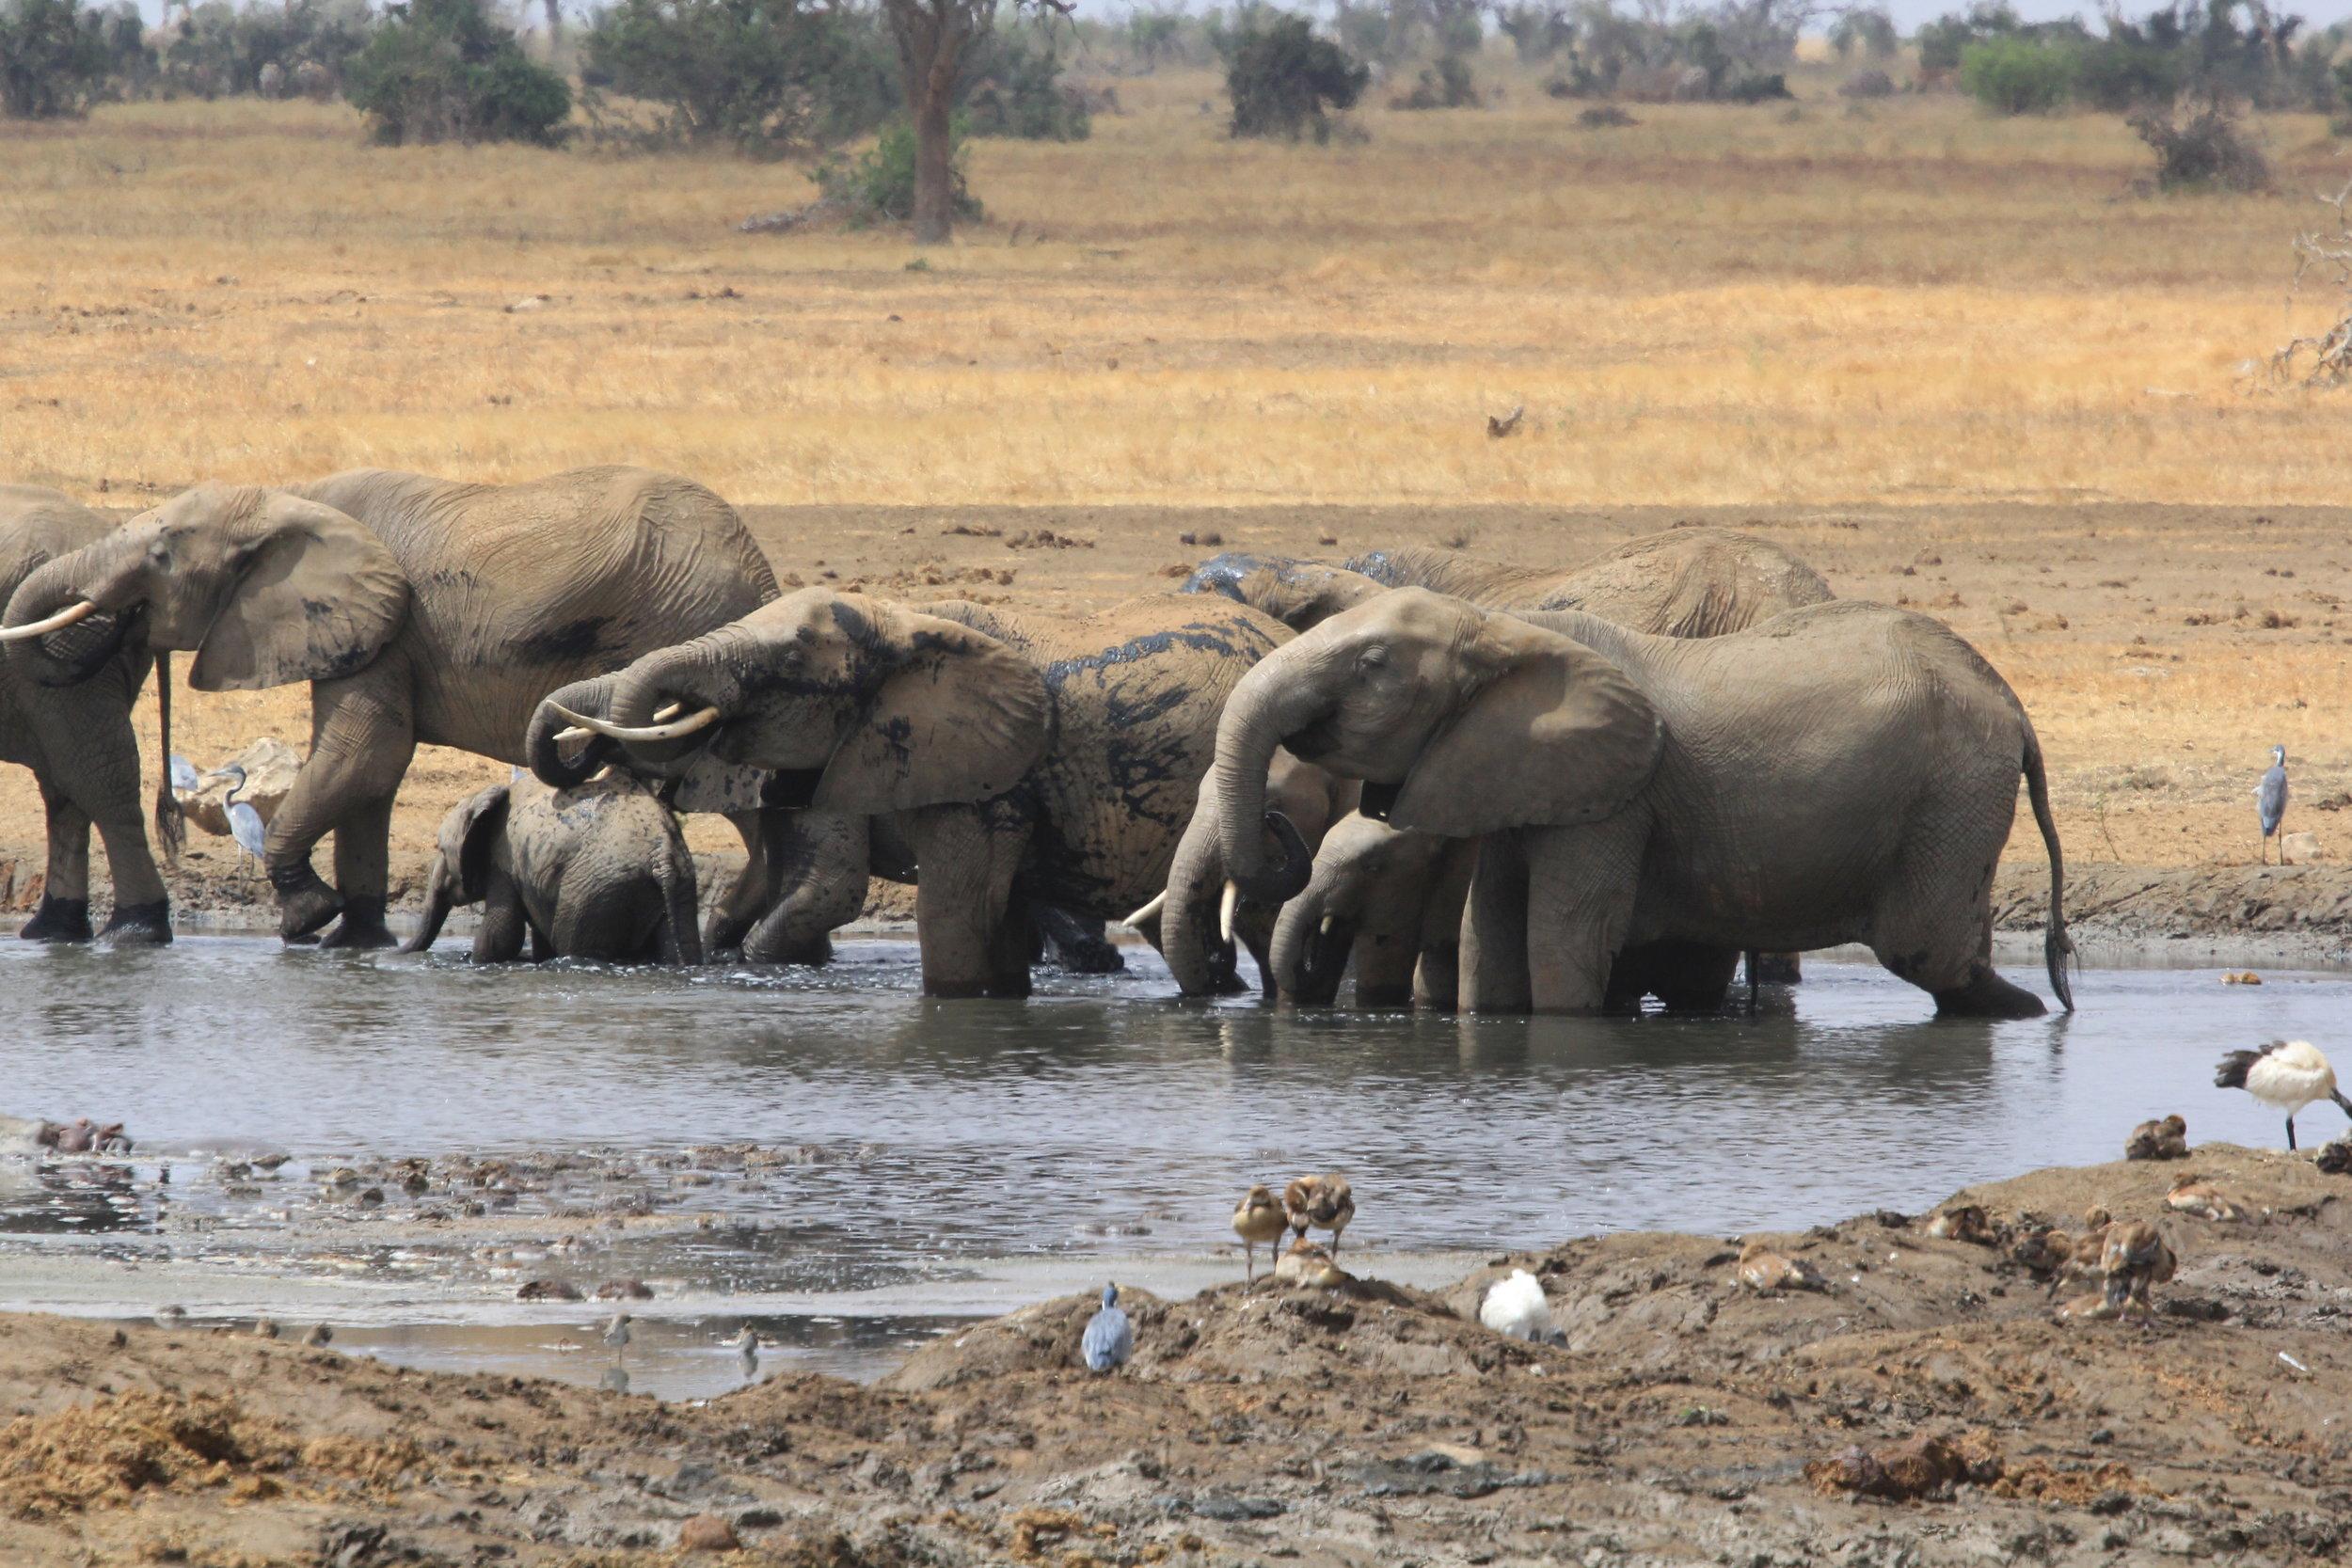 elephants at watering hole Tsavo East national park